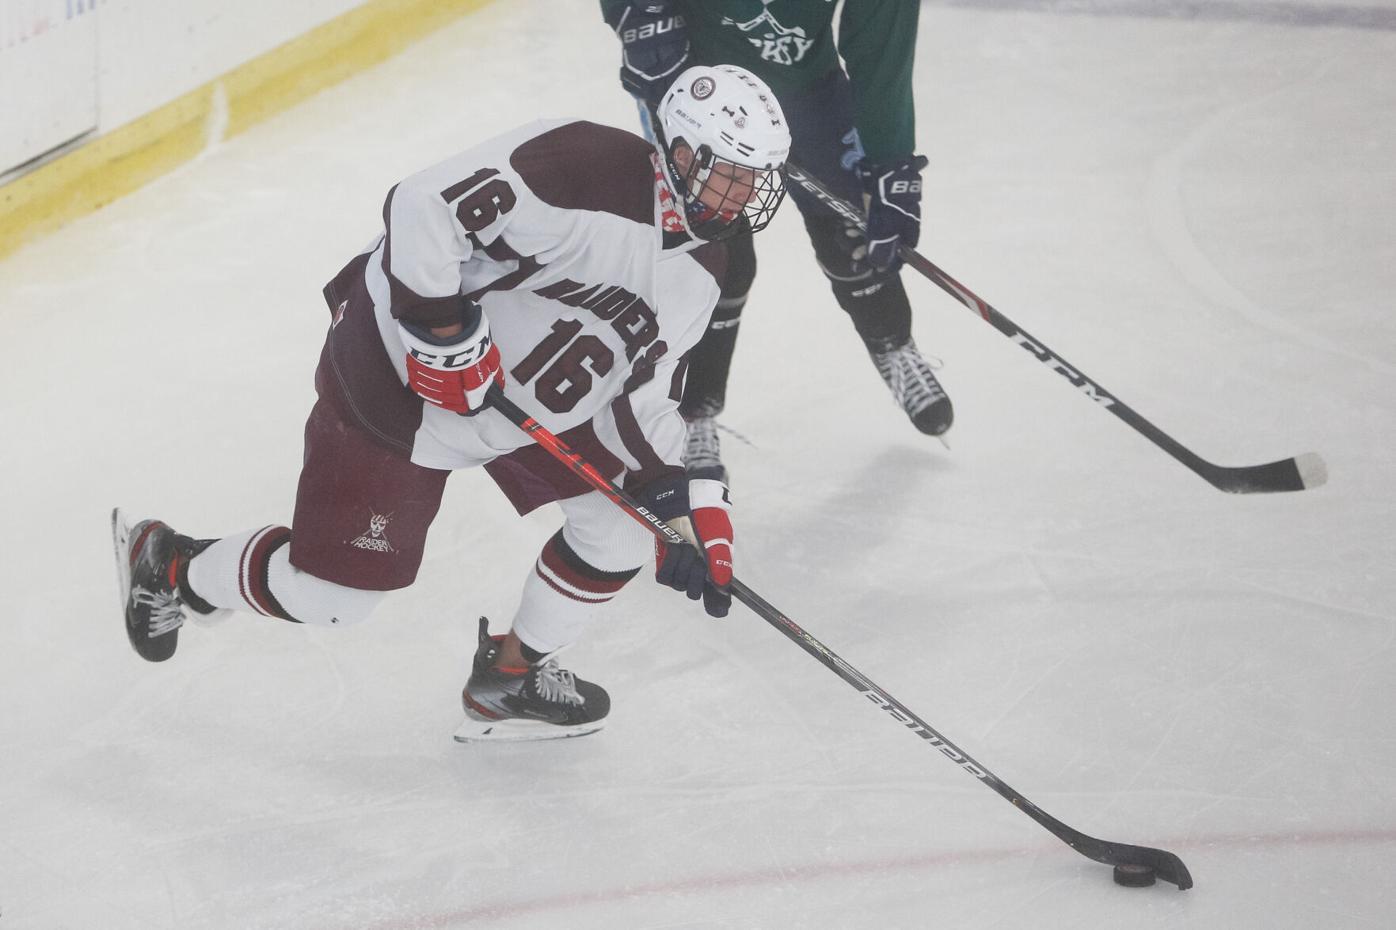 Sc ice hockey Brian Nicholas